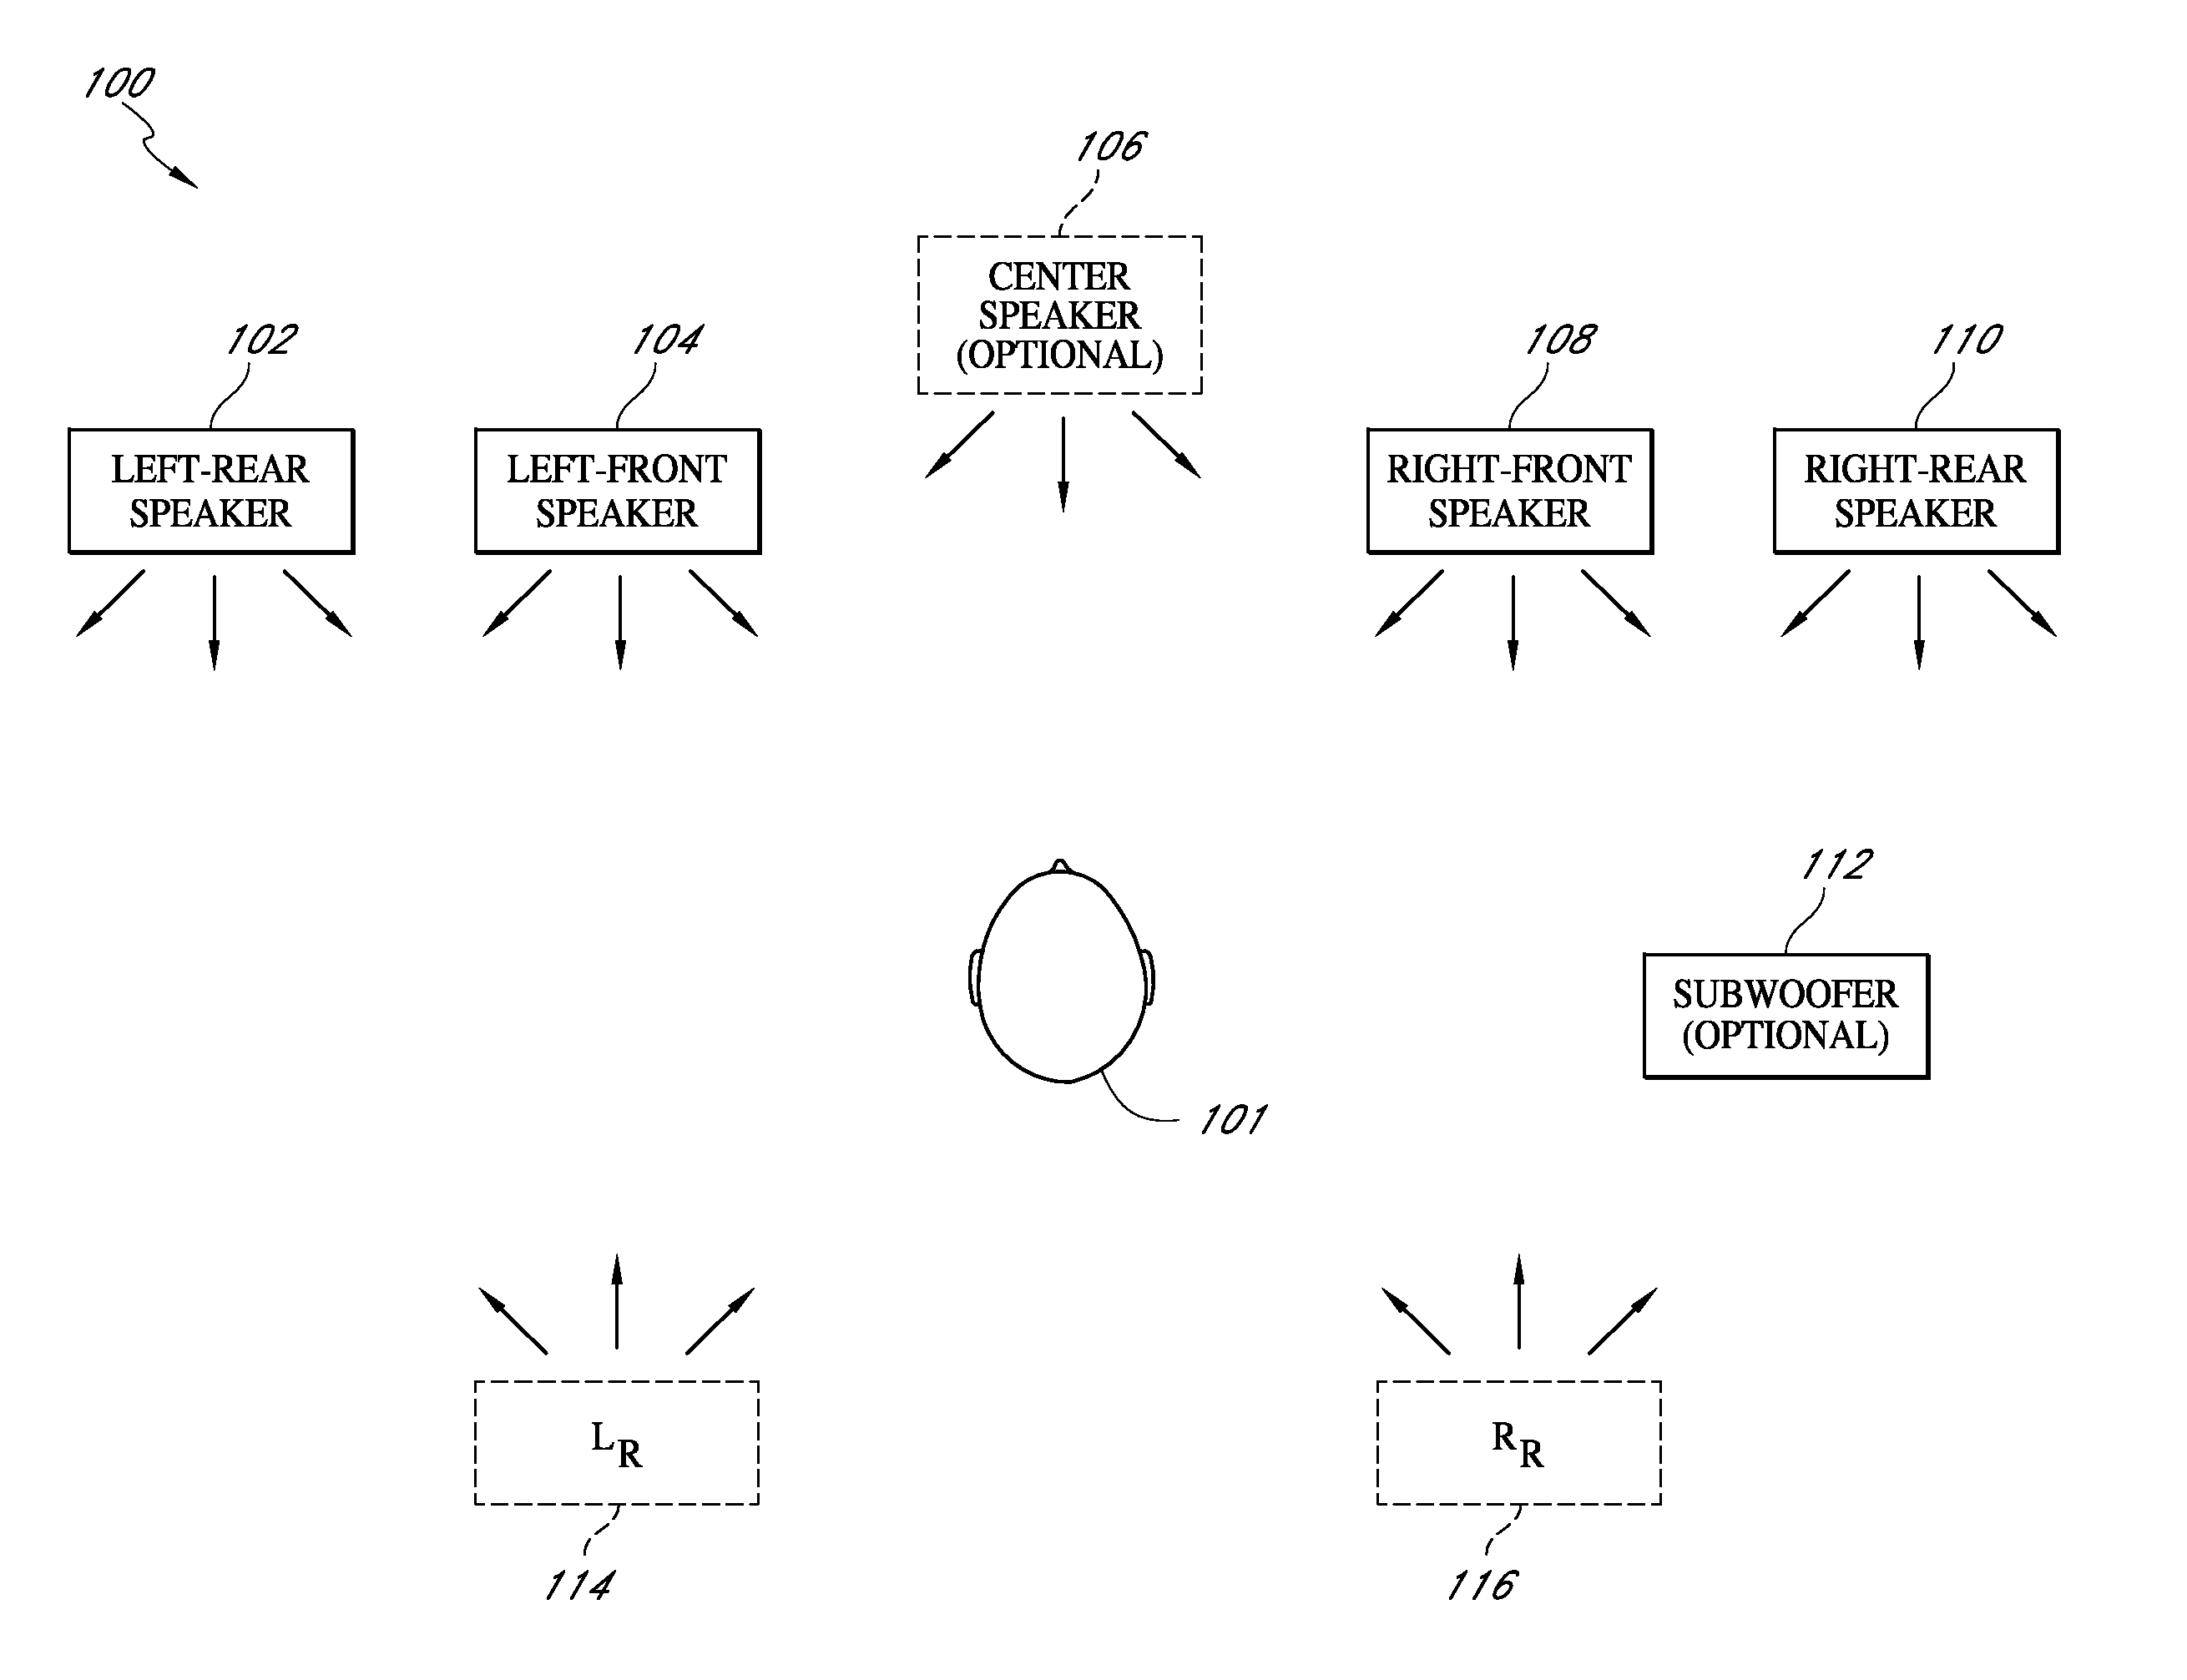 Patent Us 9232312 B2 Yamaha Wiring Diagram Bose 901 To Powered Mixer First Claim